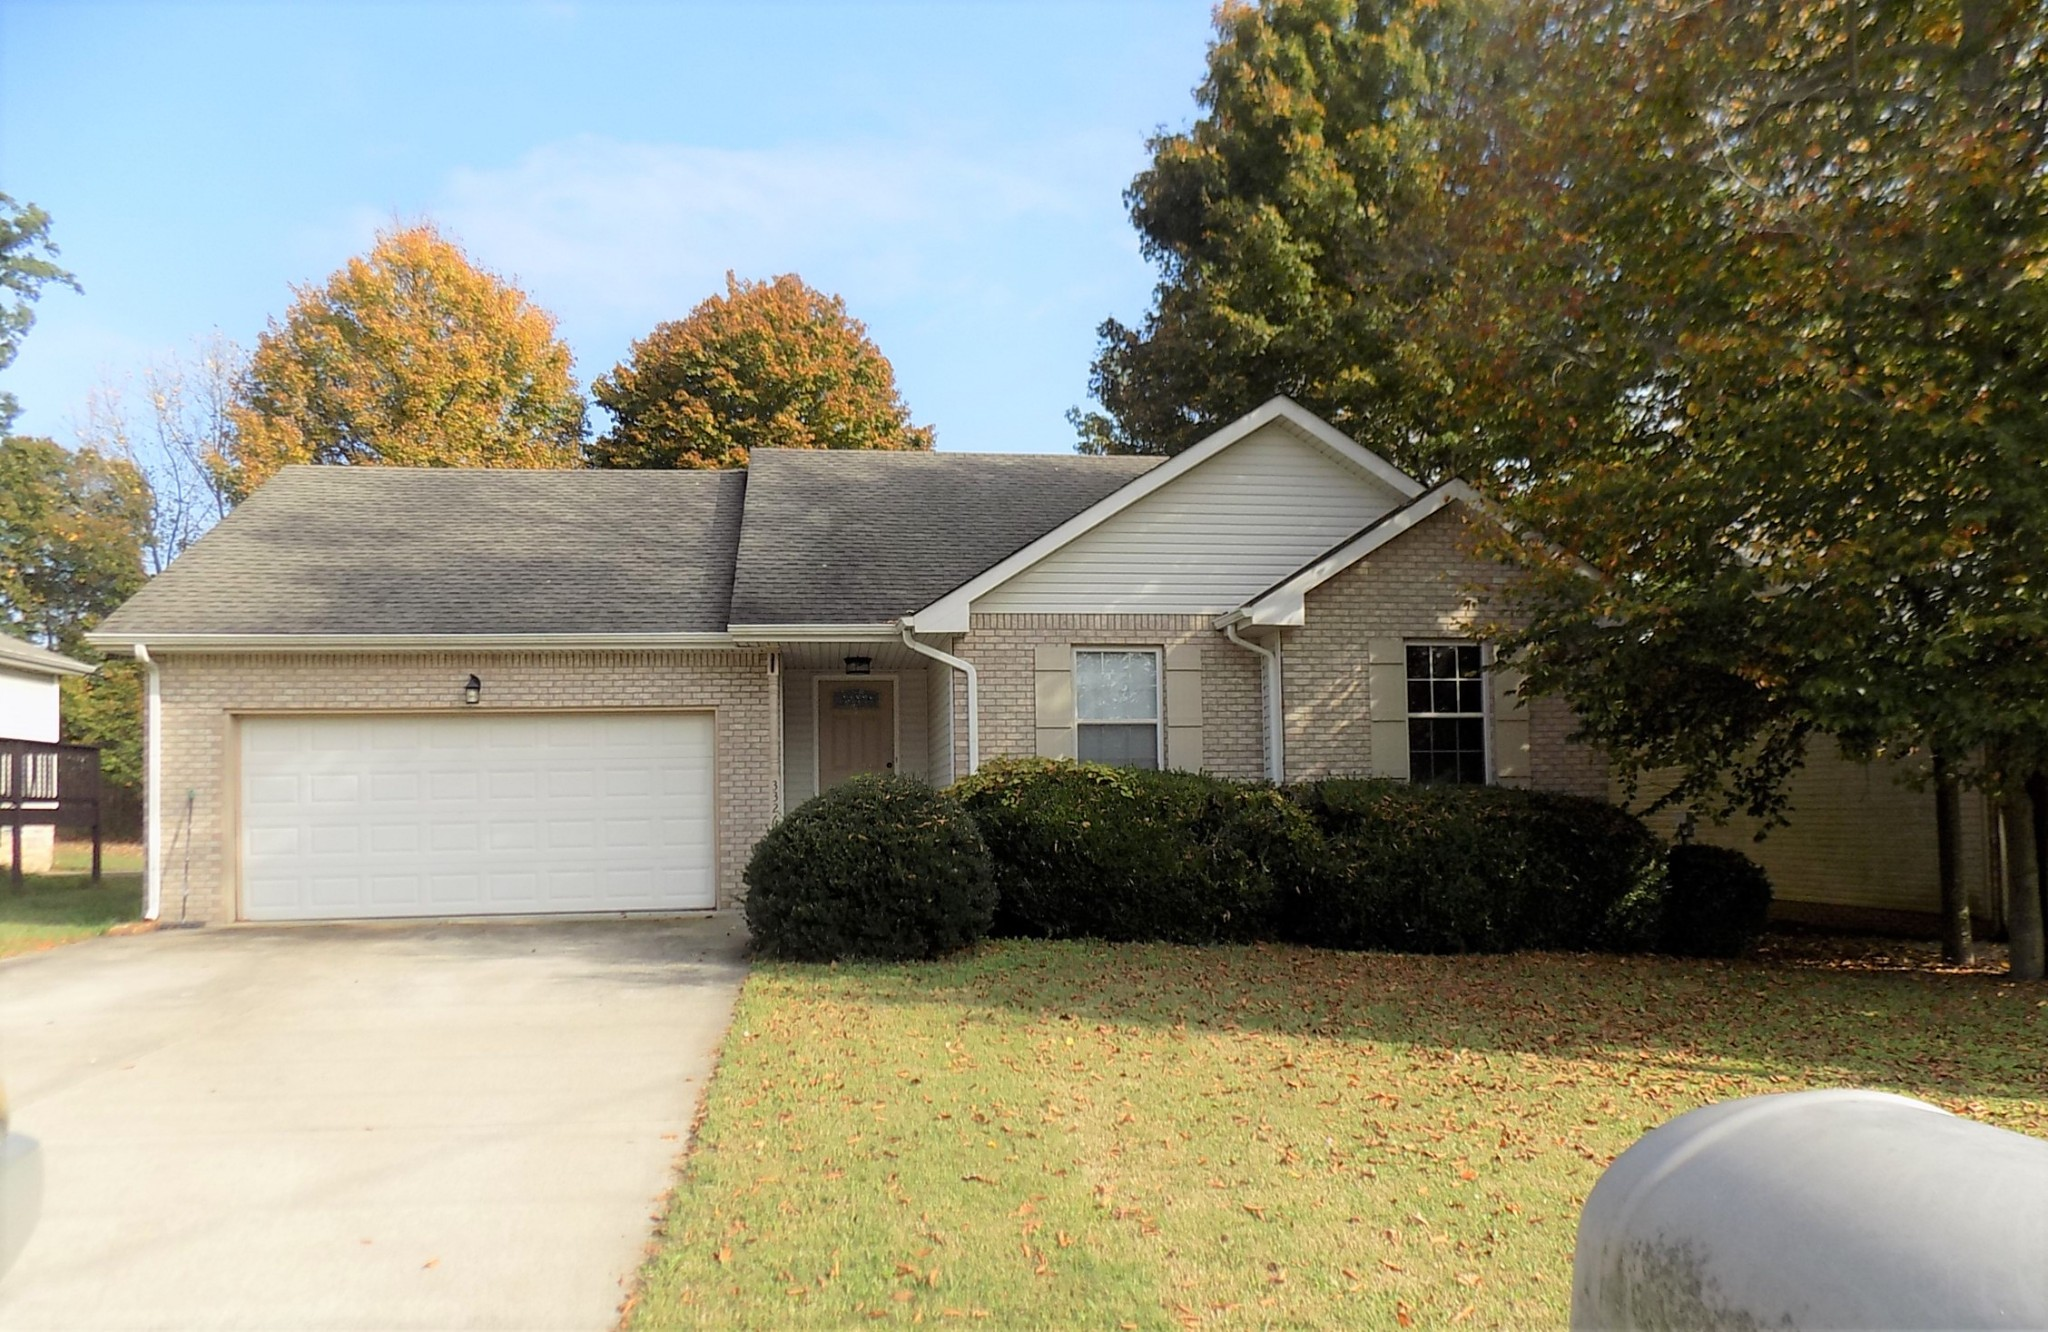 3326 S Senseney Cir Property Photo - Clarksville, TN real estate listing